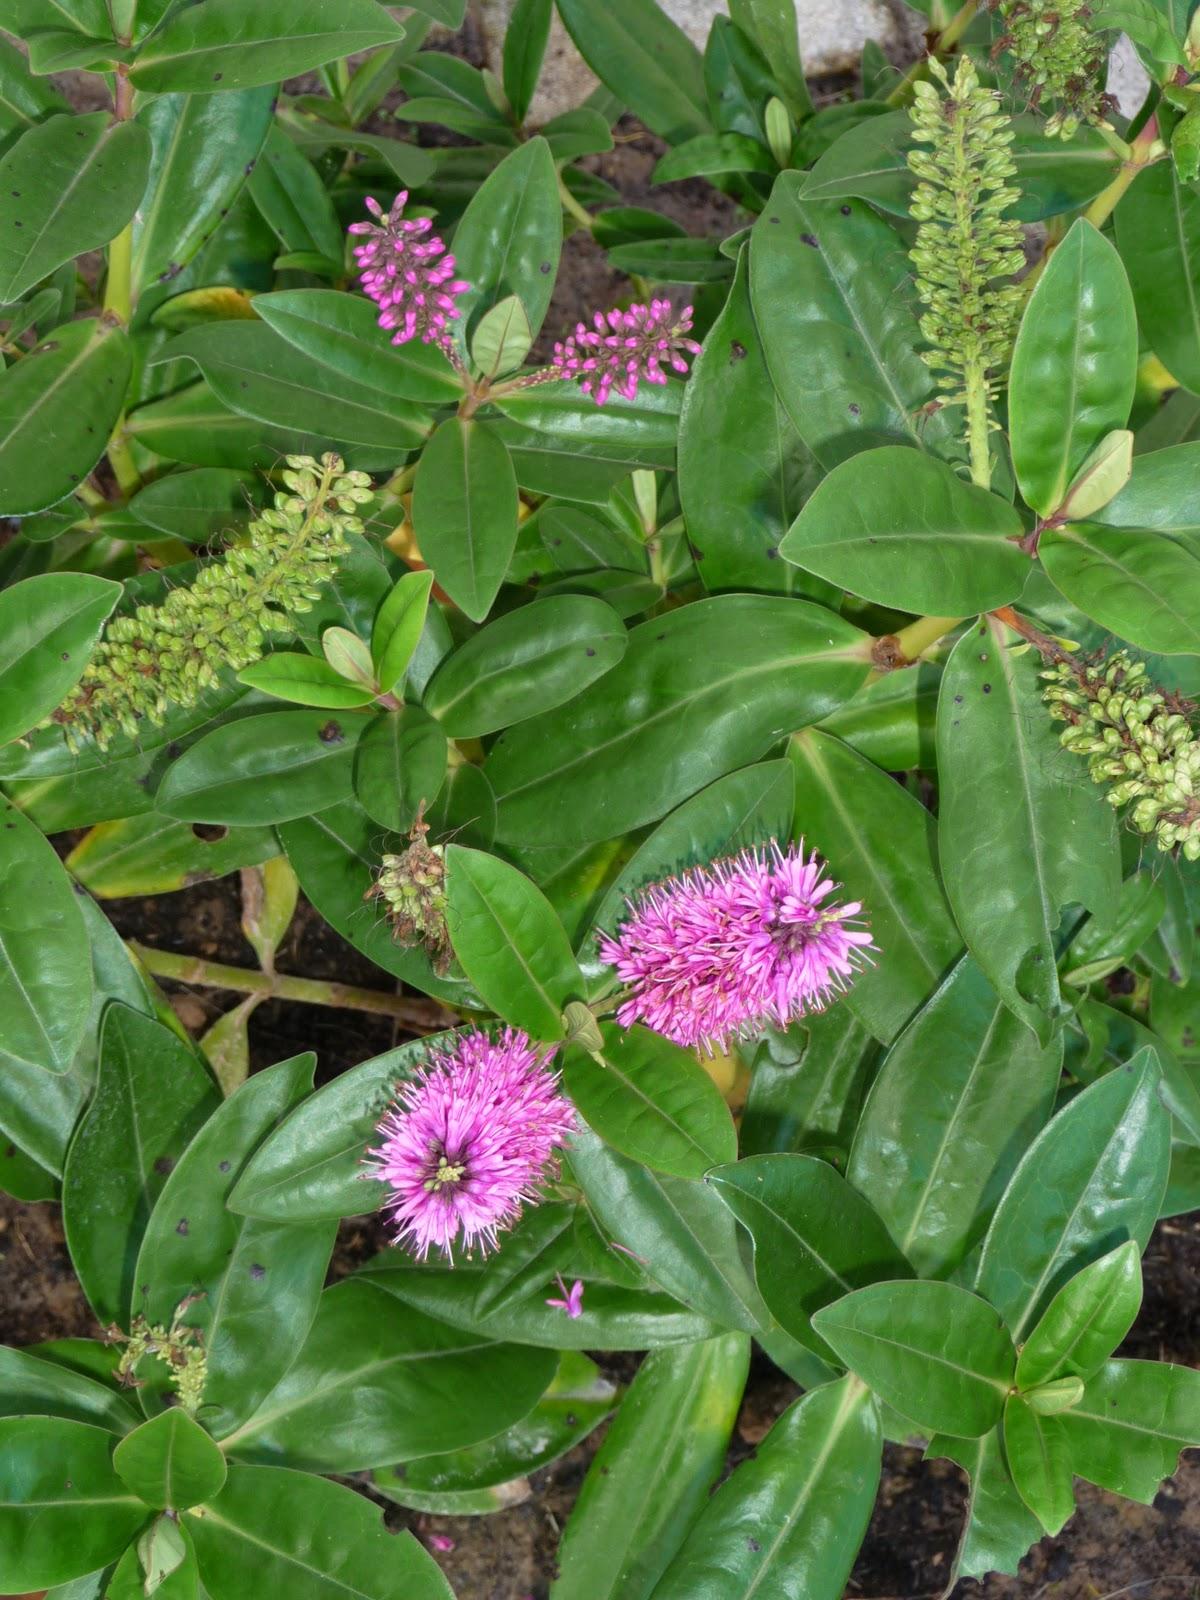 Ma terre de bruy re plantations de la terrasse massif n 1 for Plante arbustive fleurie